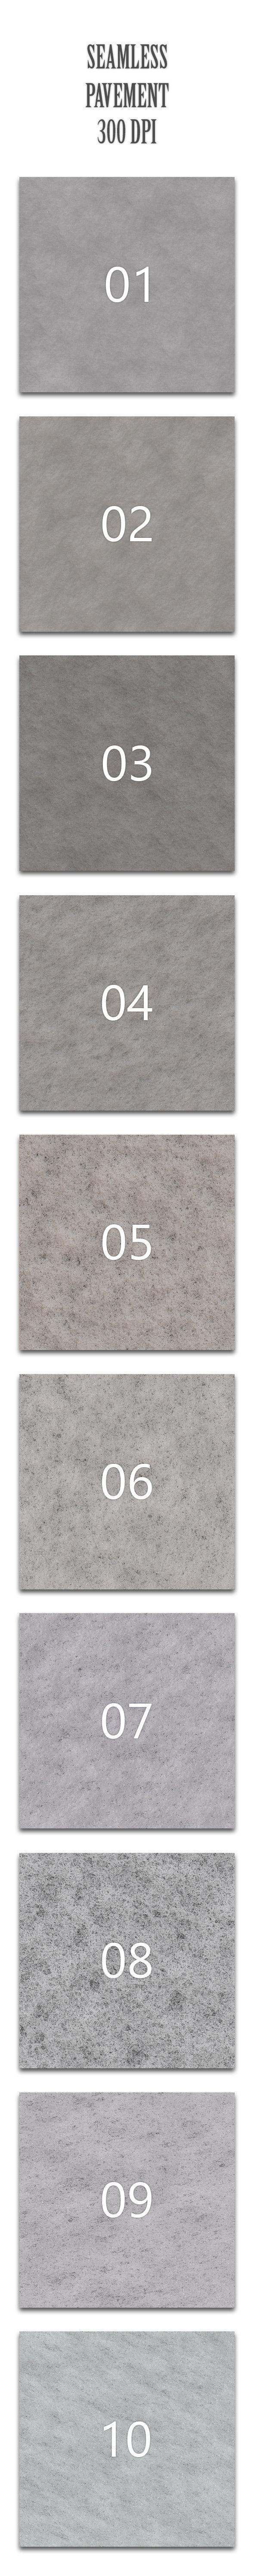 Seamless Pavement - Textures / Fills / Patterns Photoshop